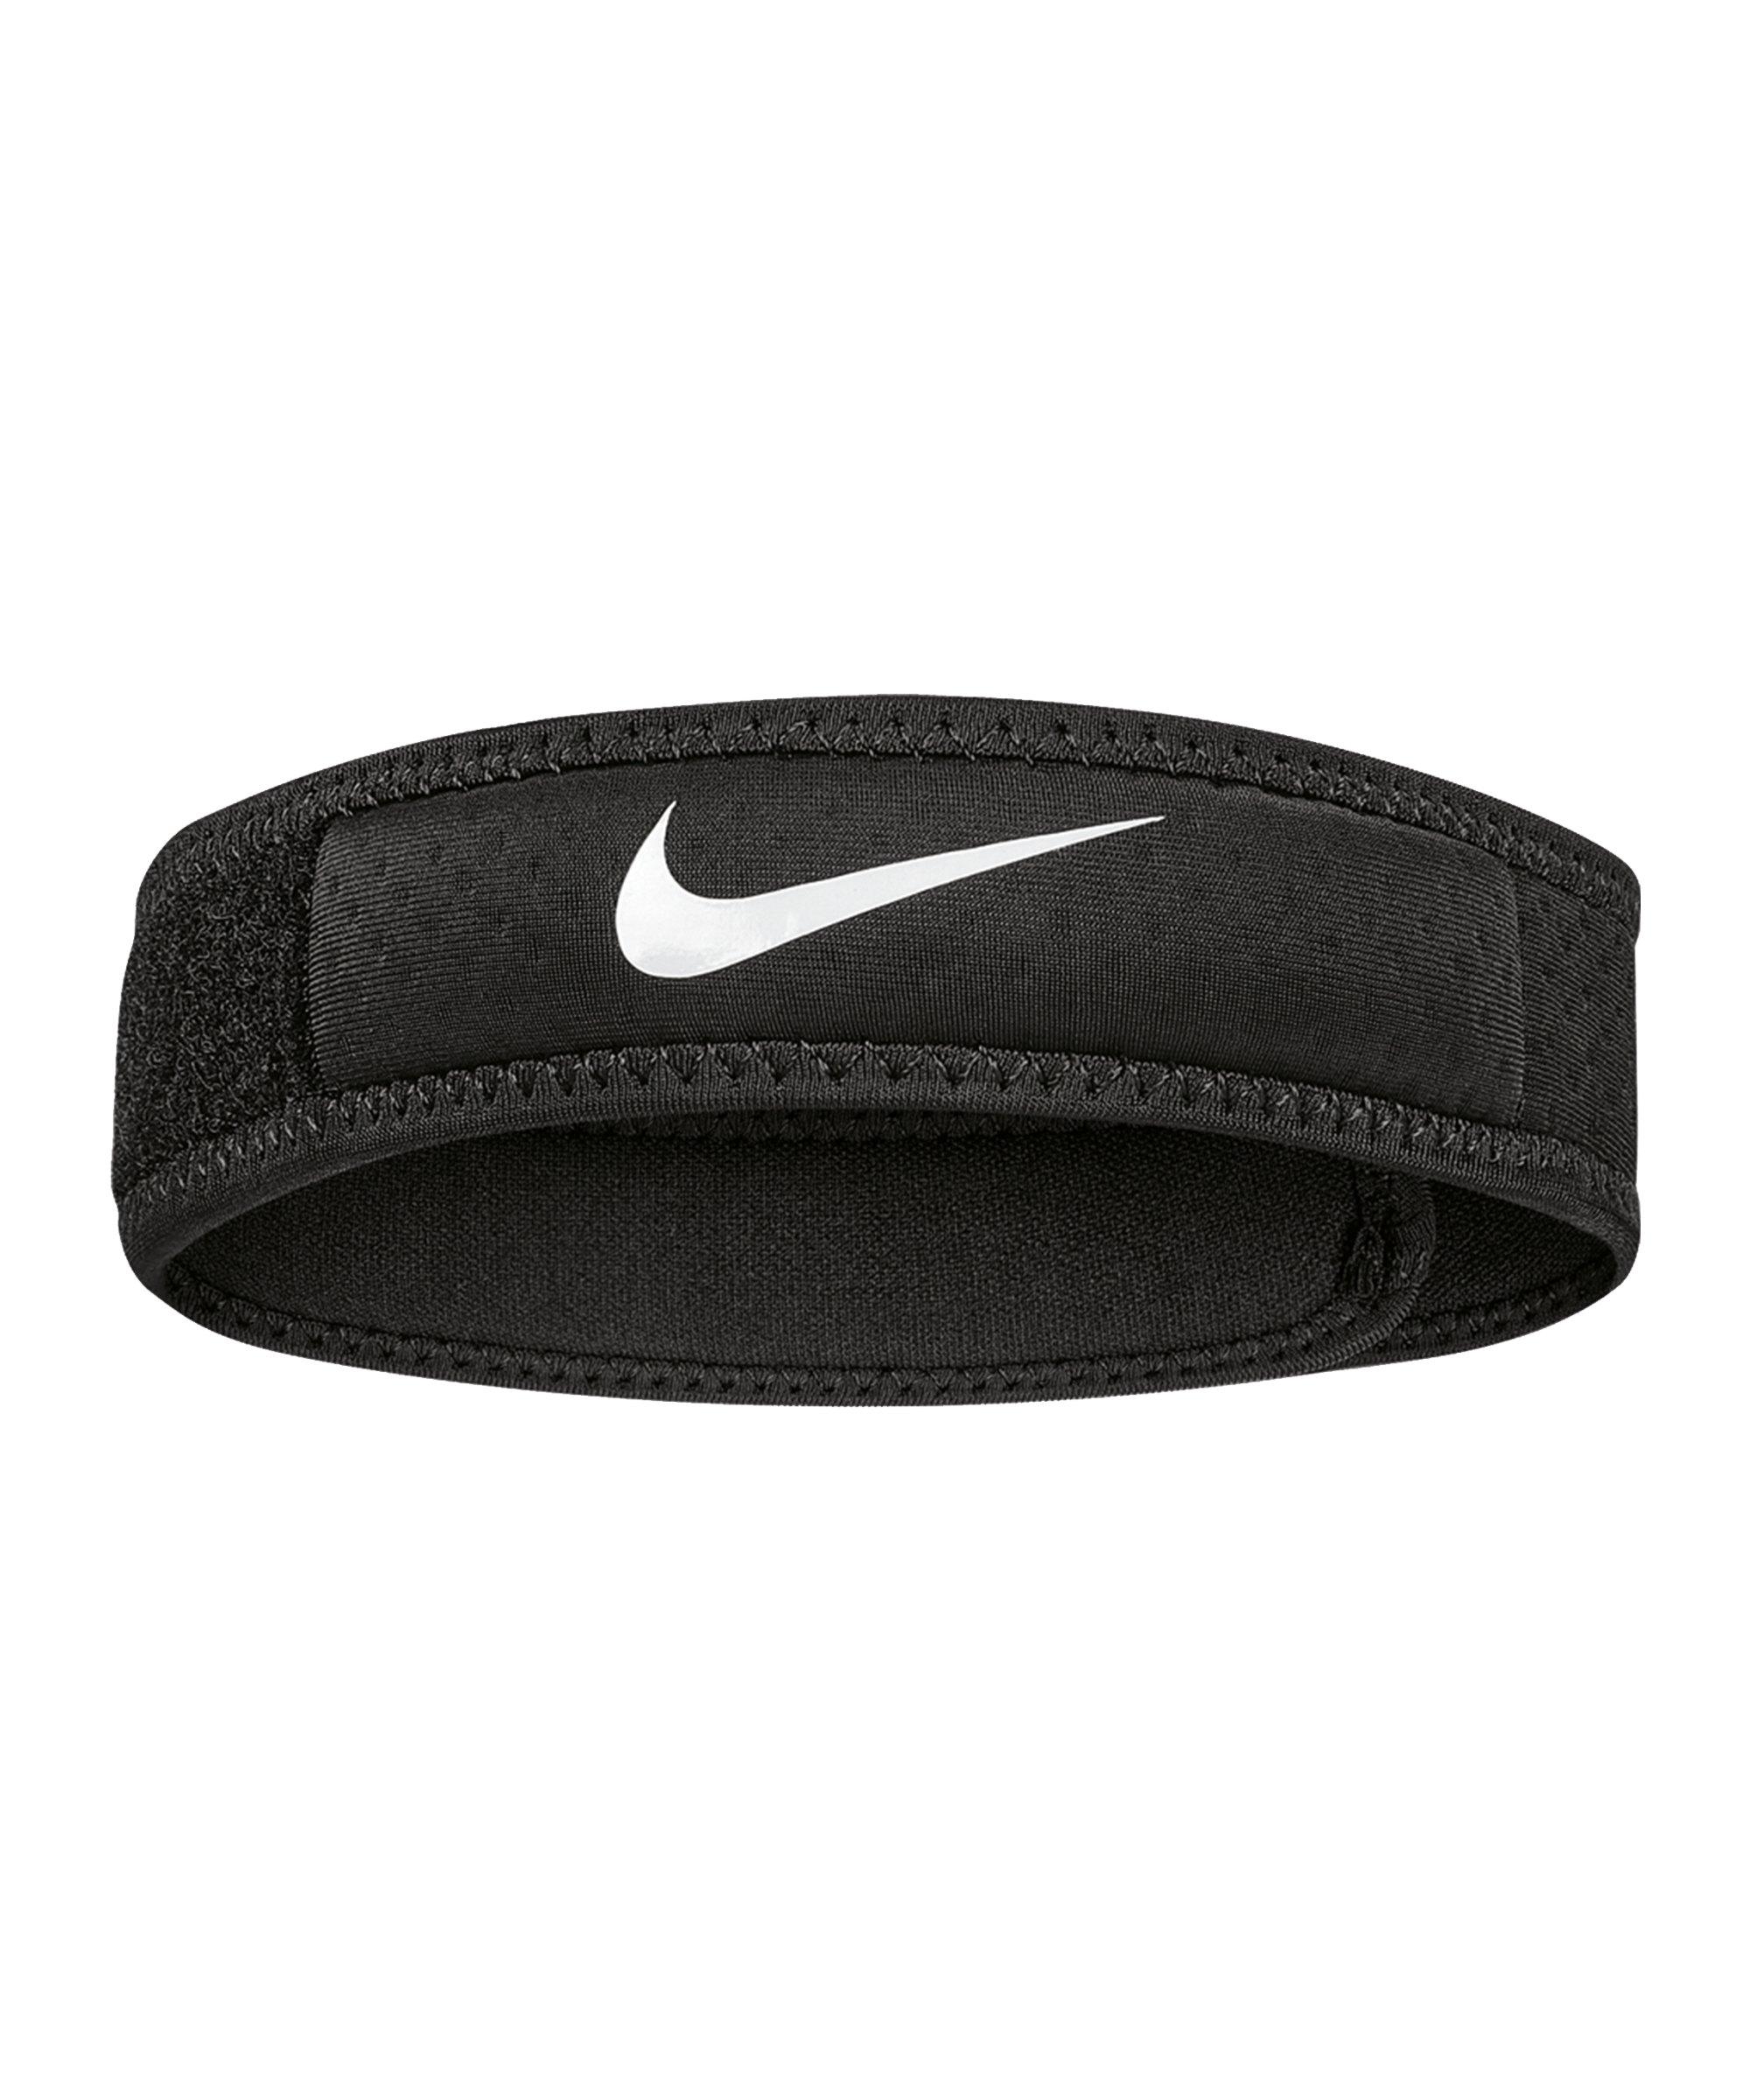 Nike Pro Patella Band 2.0 Schwarz Weiss F010 - schwarz